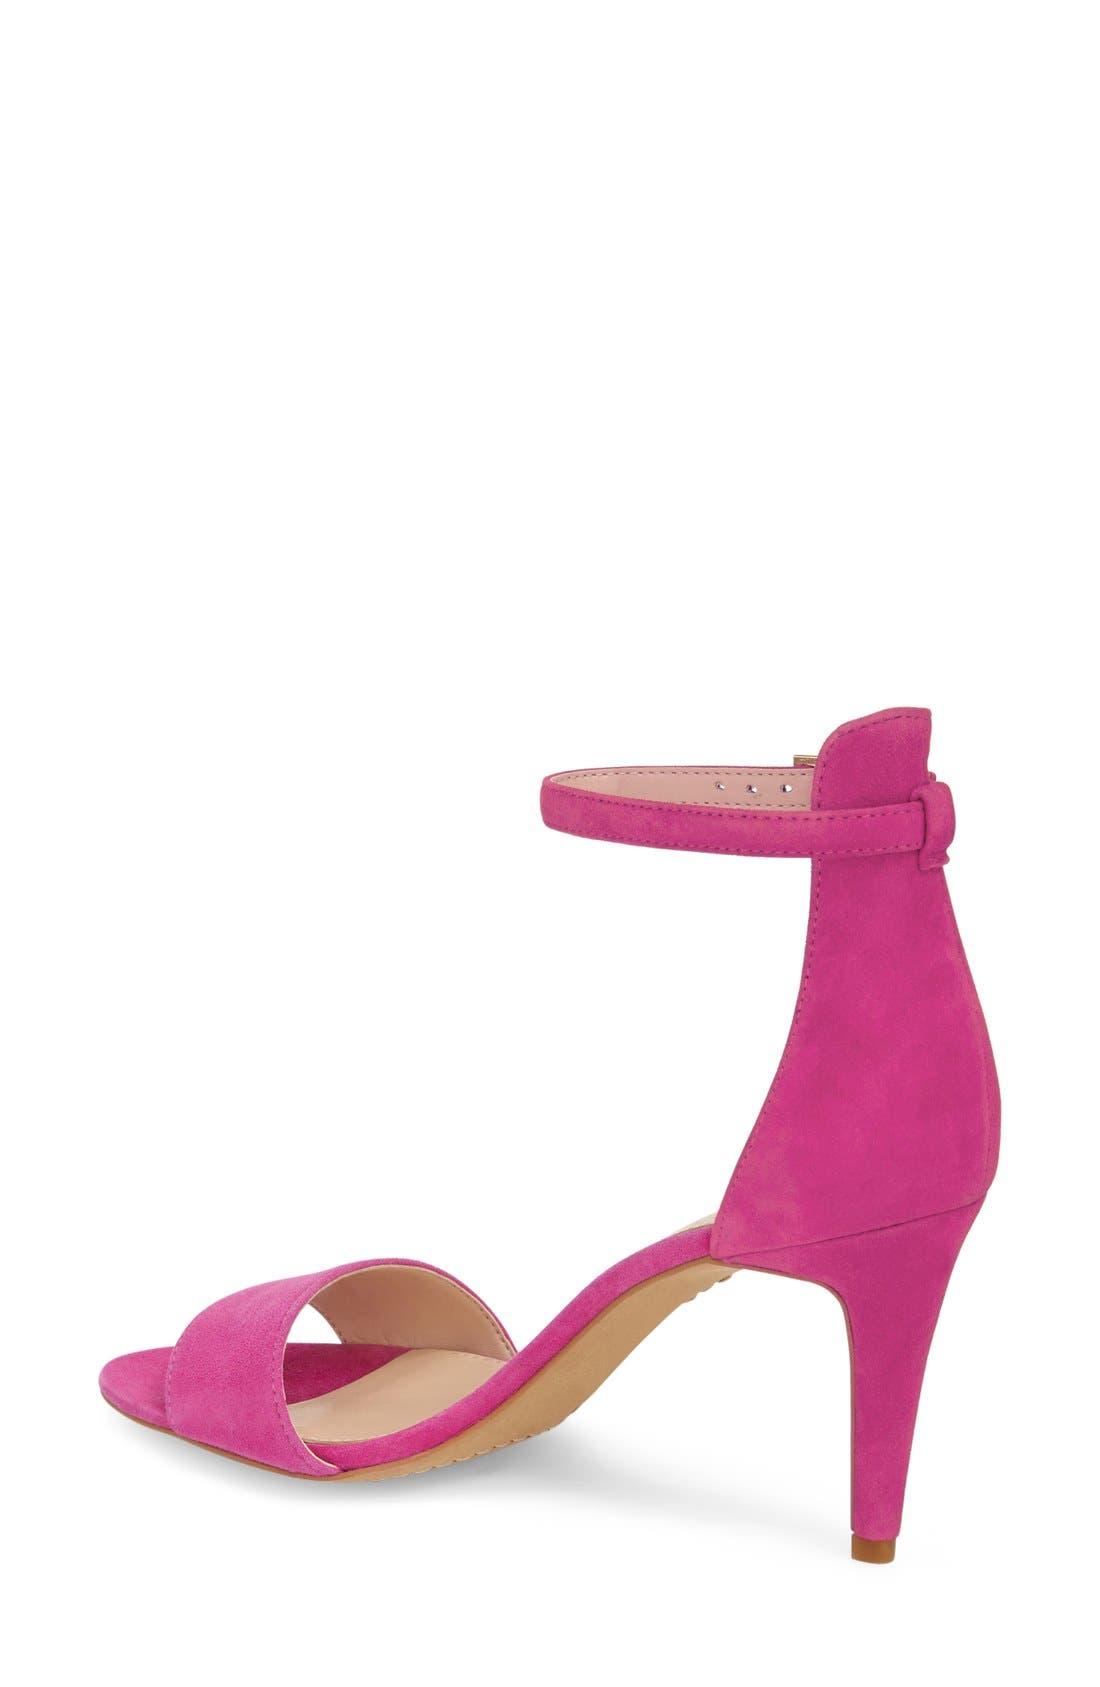 ,                             'Court' Ankle Strap Sandal,                             Alternate thumbnail 97, color,                             661